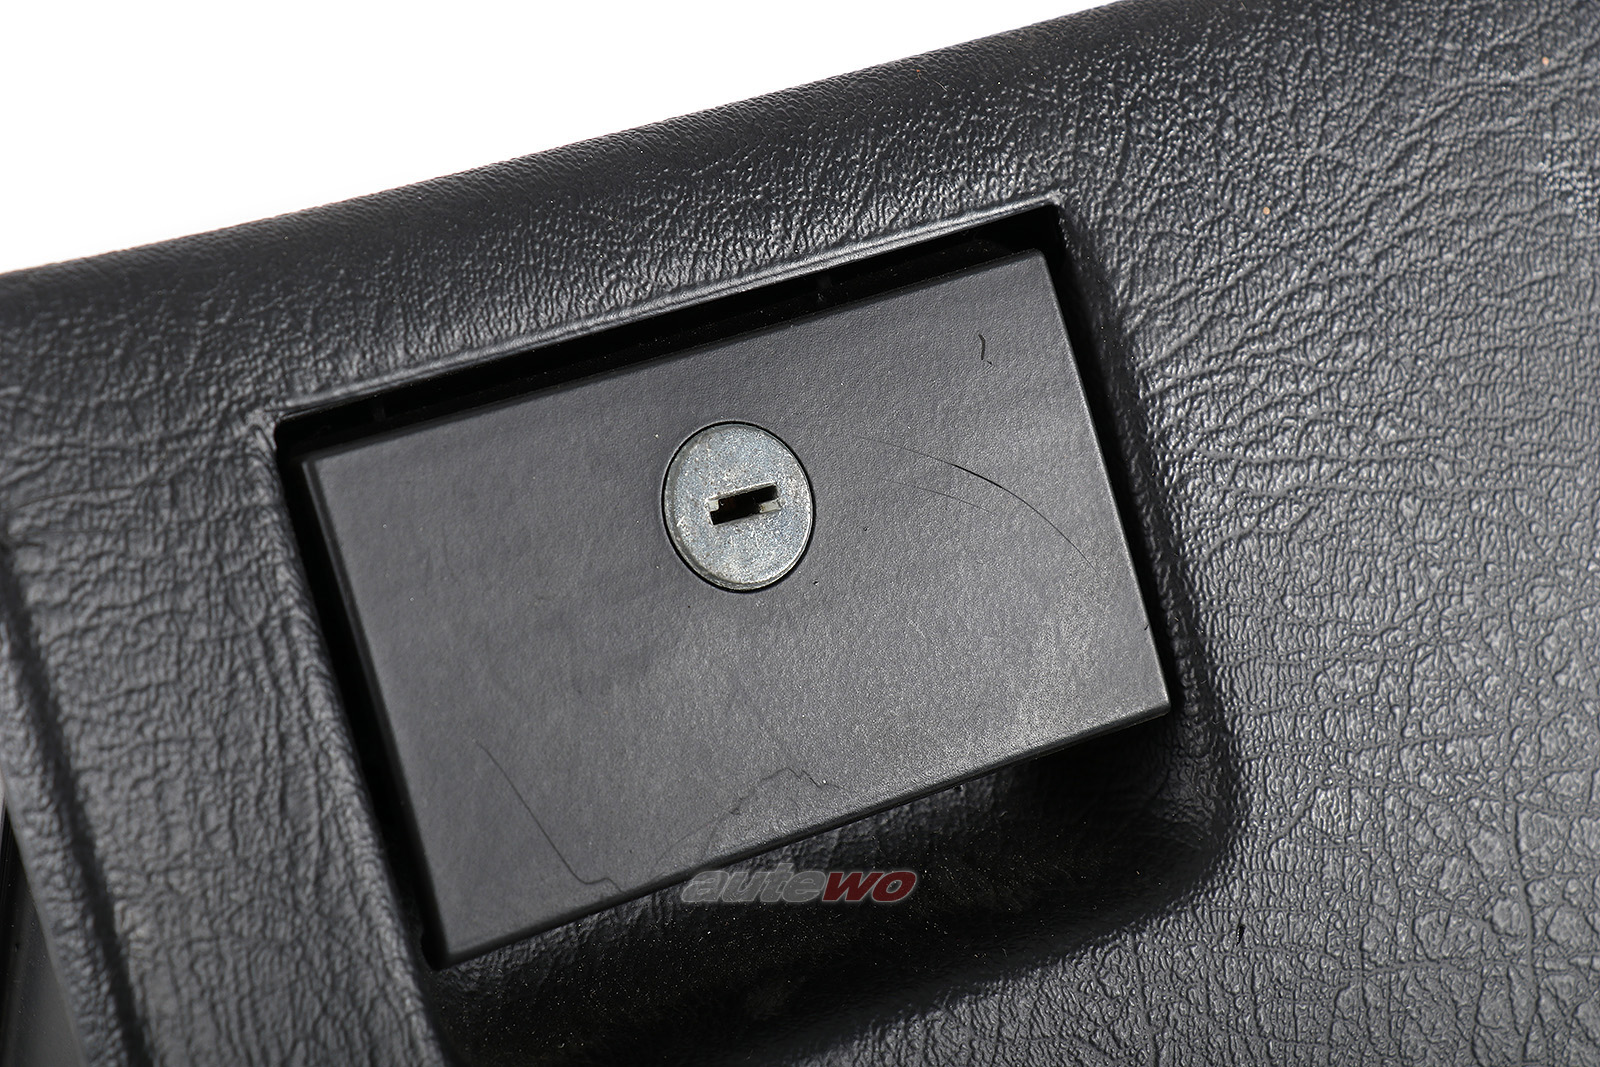 893857035D 8A1857035F Audi 80/90/Coupe/Cabrio Typ 89 Handschuhfach